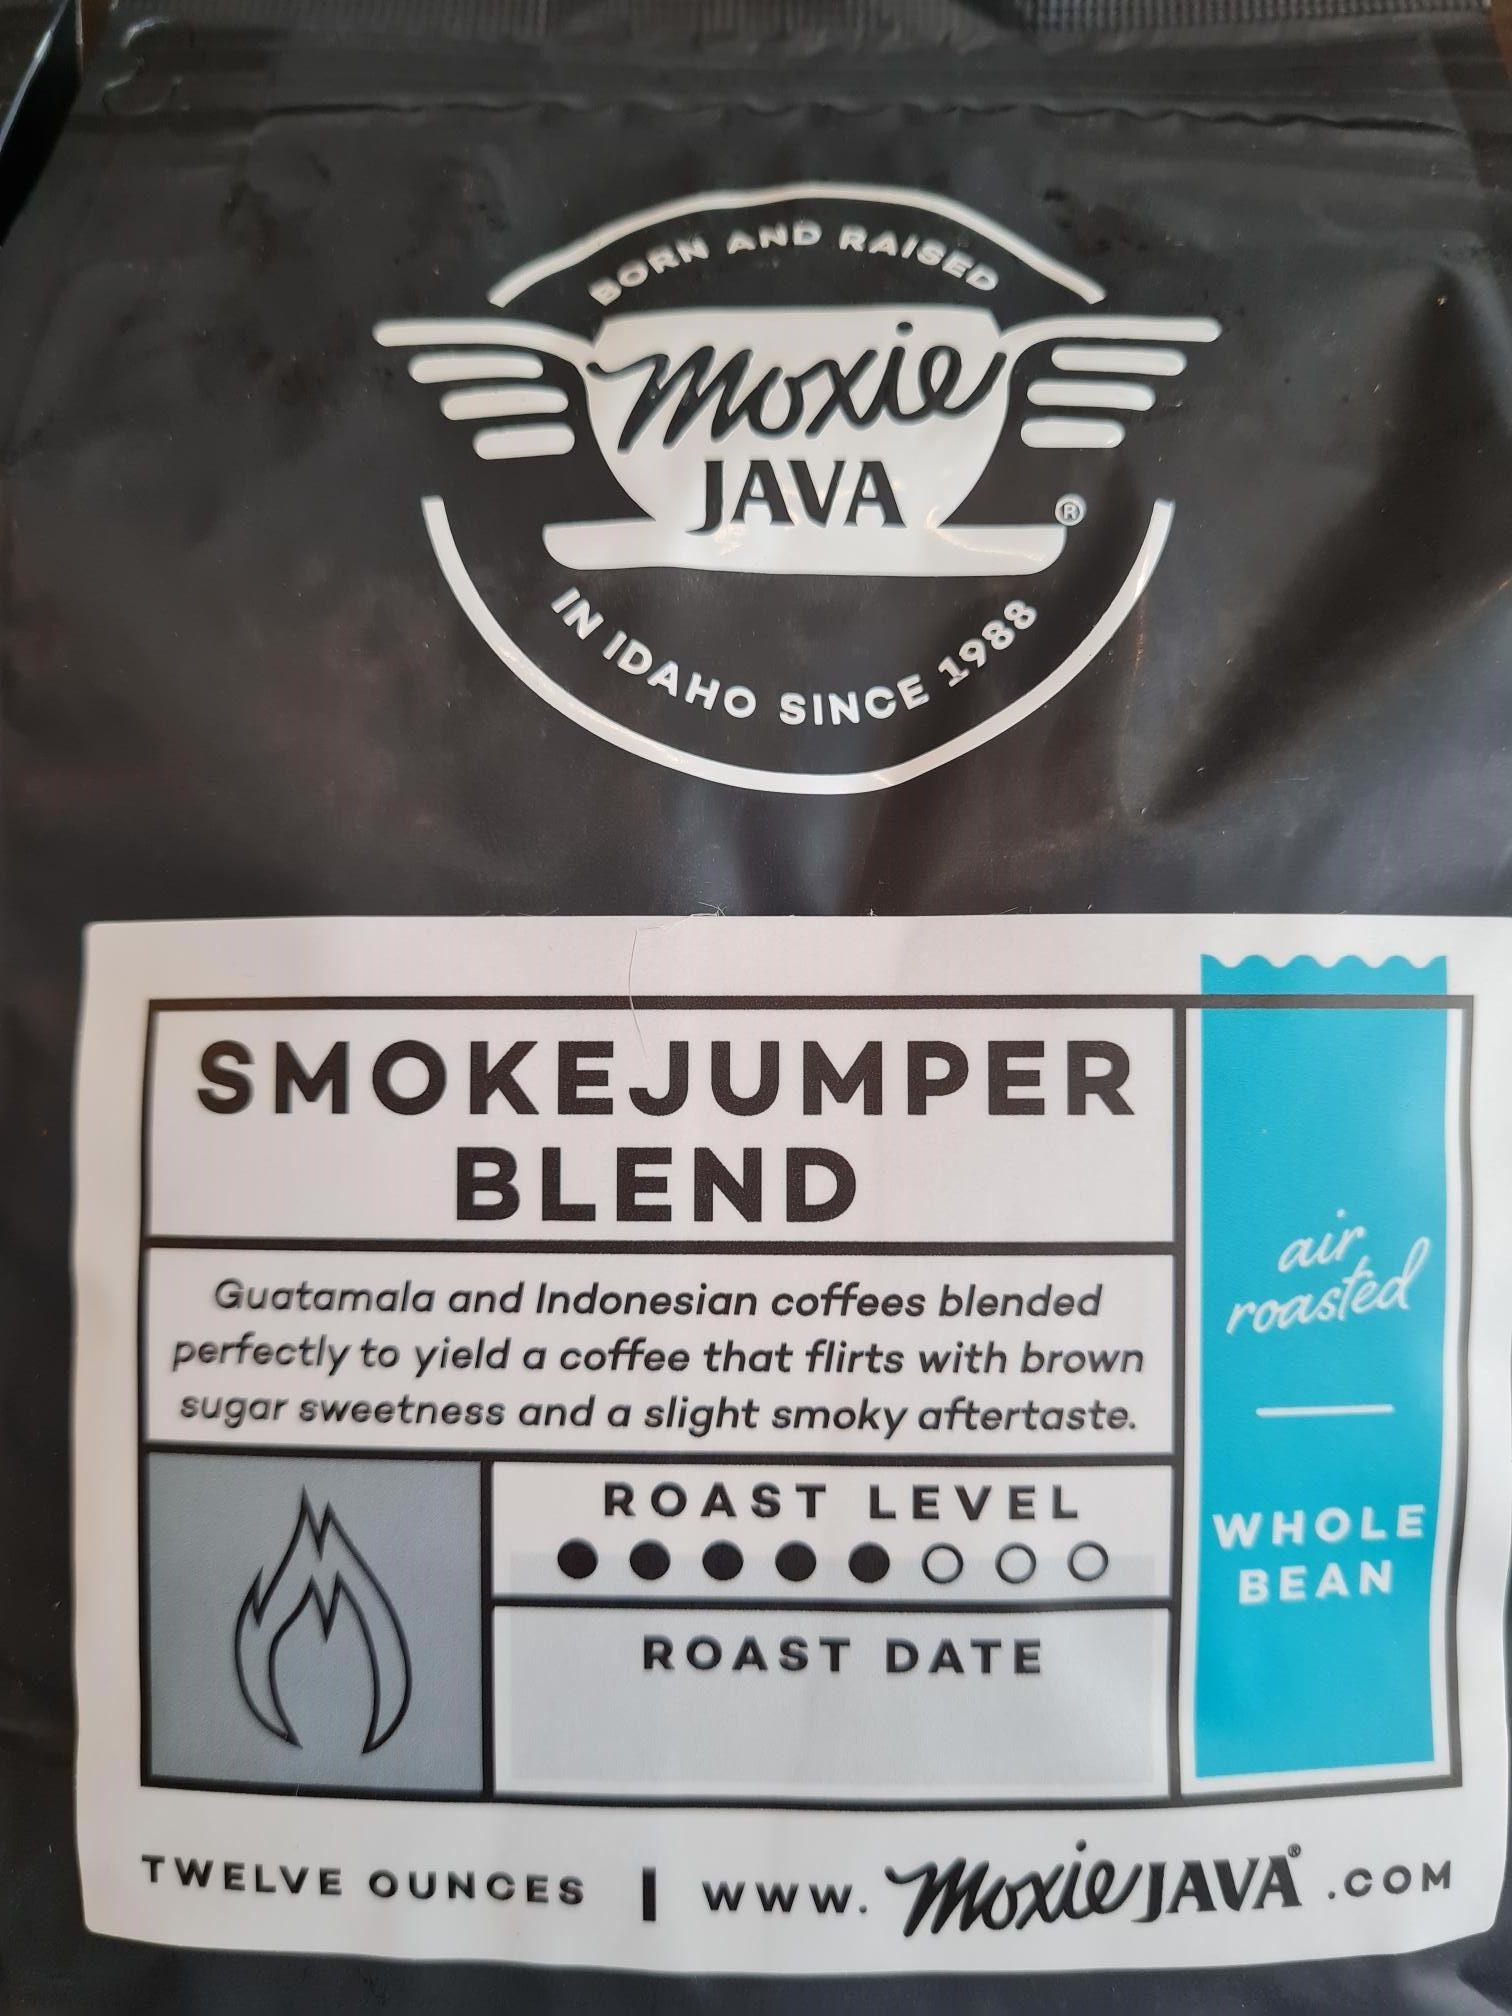 MOXI JAVA Smoke Jumper Whole Bean